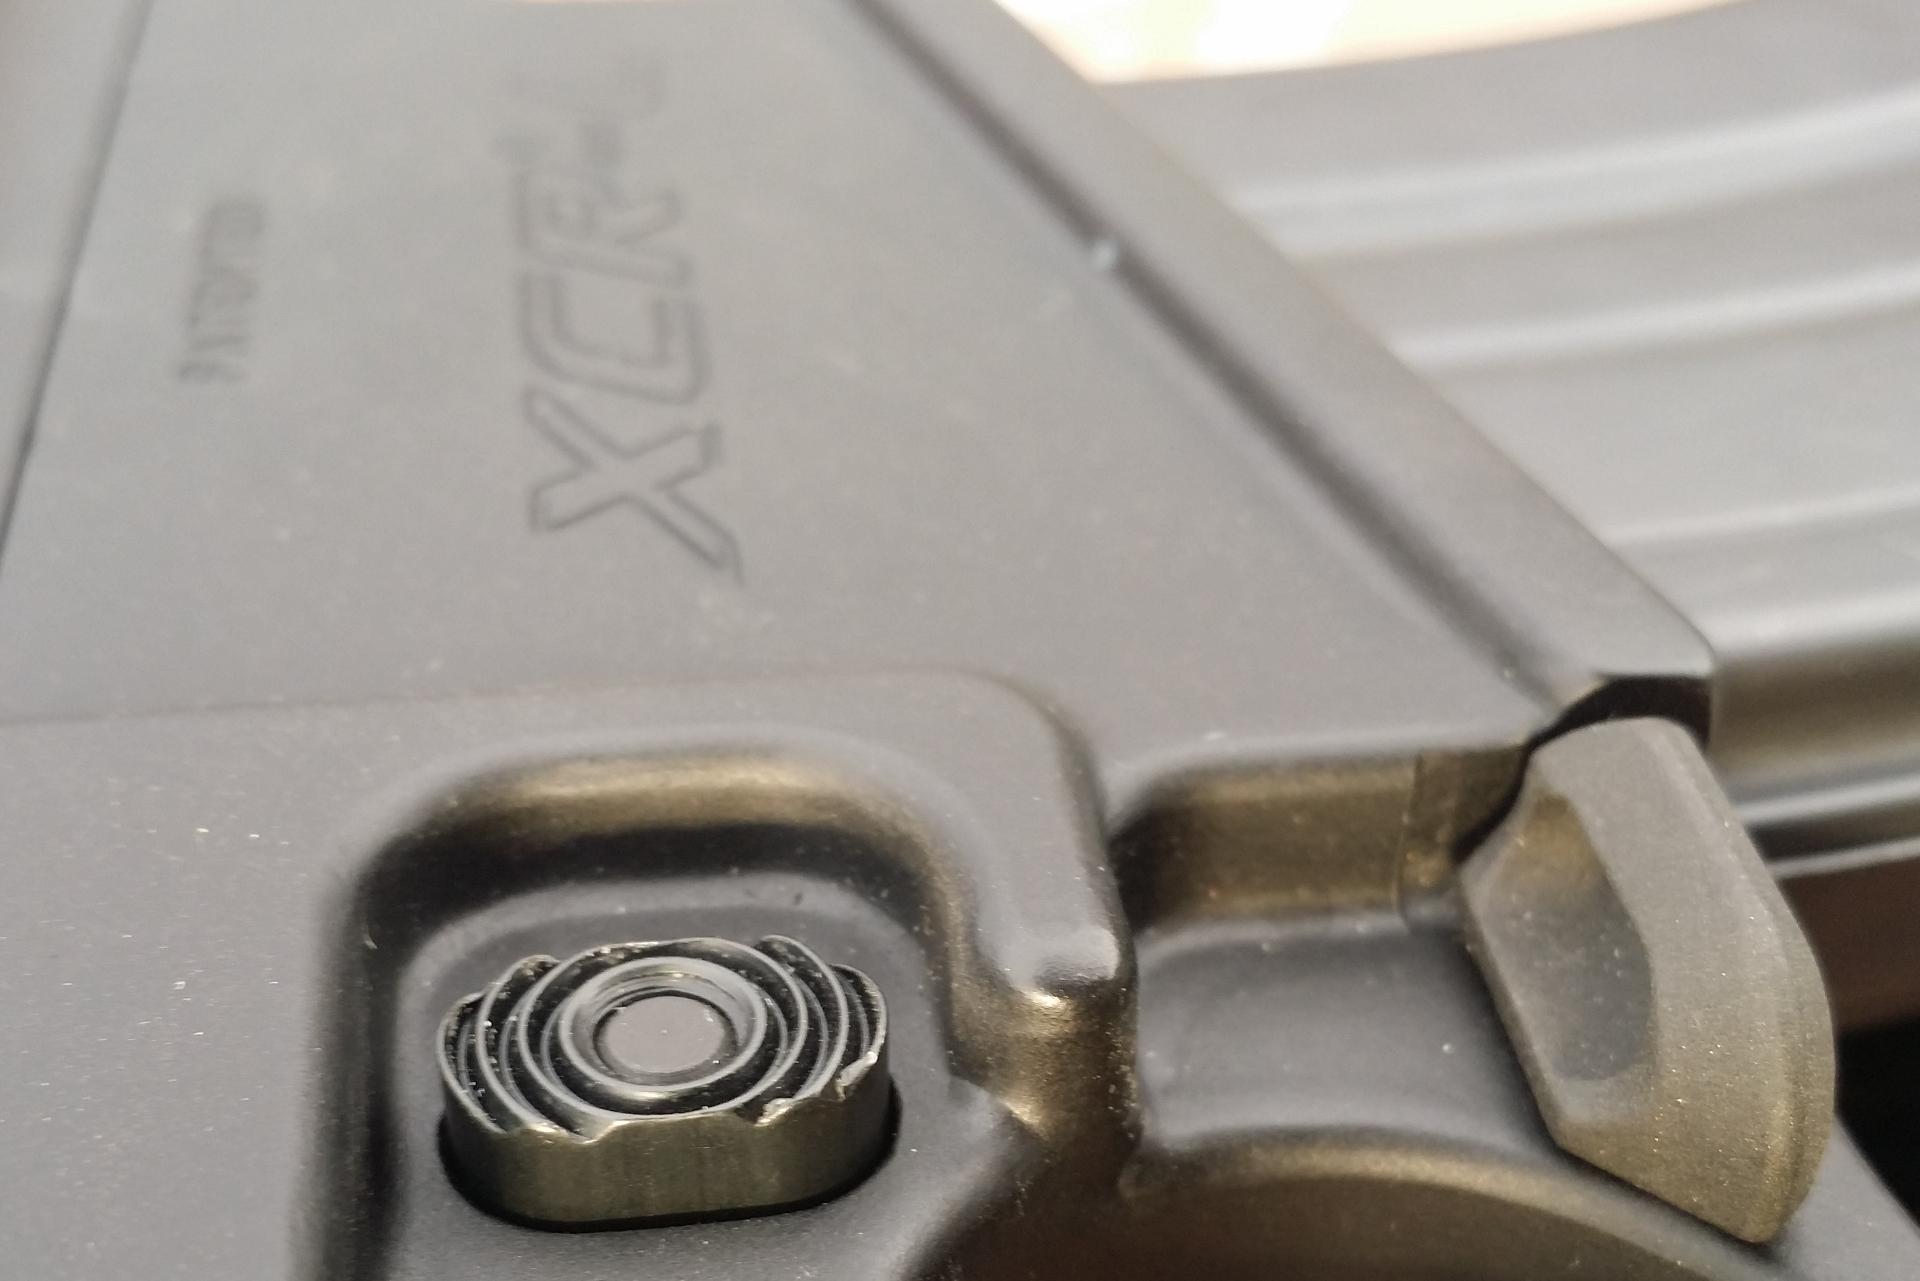 D&H 30rnd 7.62x39 Magazine Review-mag-release-asc.jpg